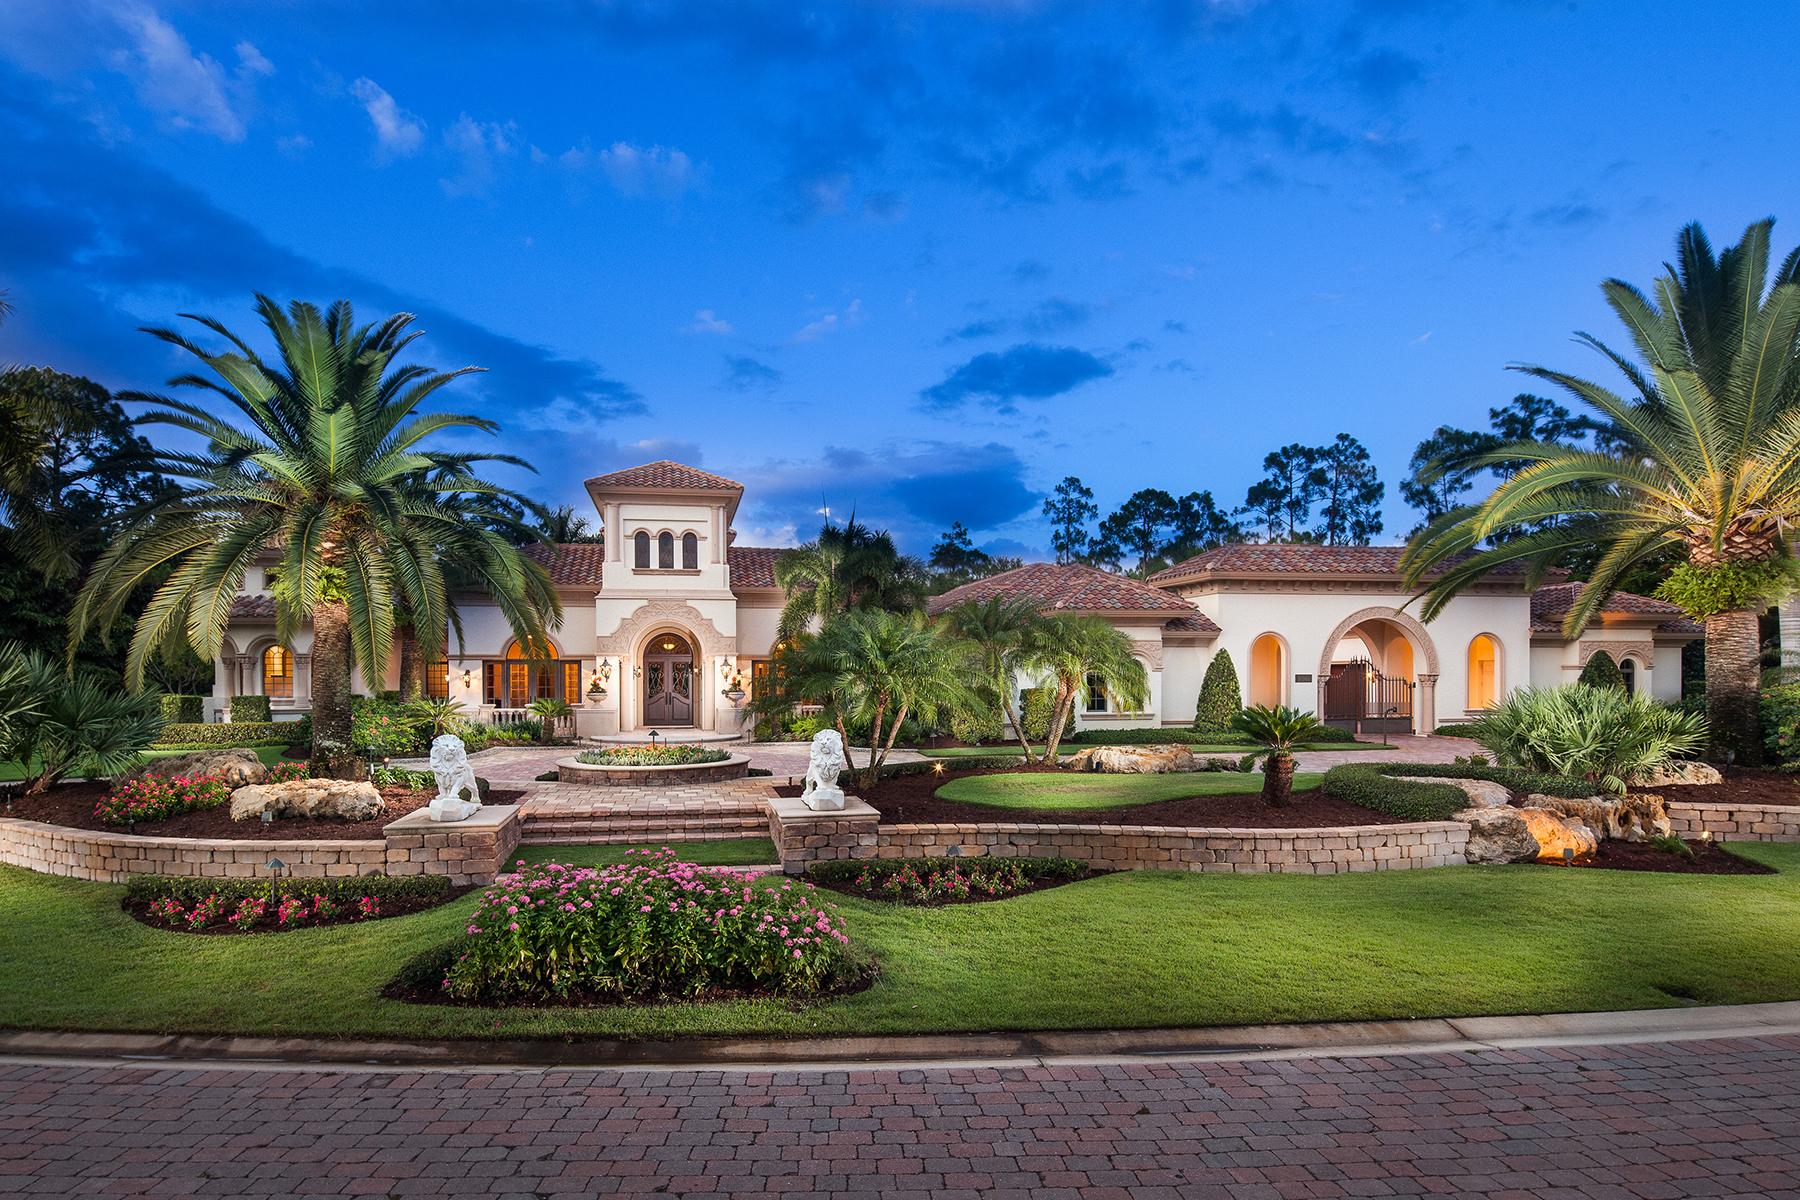 Single Family Home for Sale at MEDITERRA - VERONA 16961 Verona Ln Naples, Florida, 34110 United States